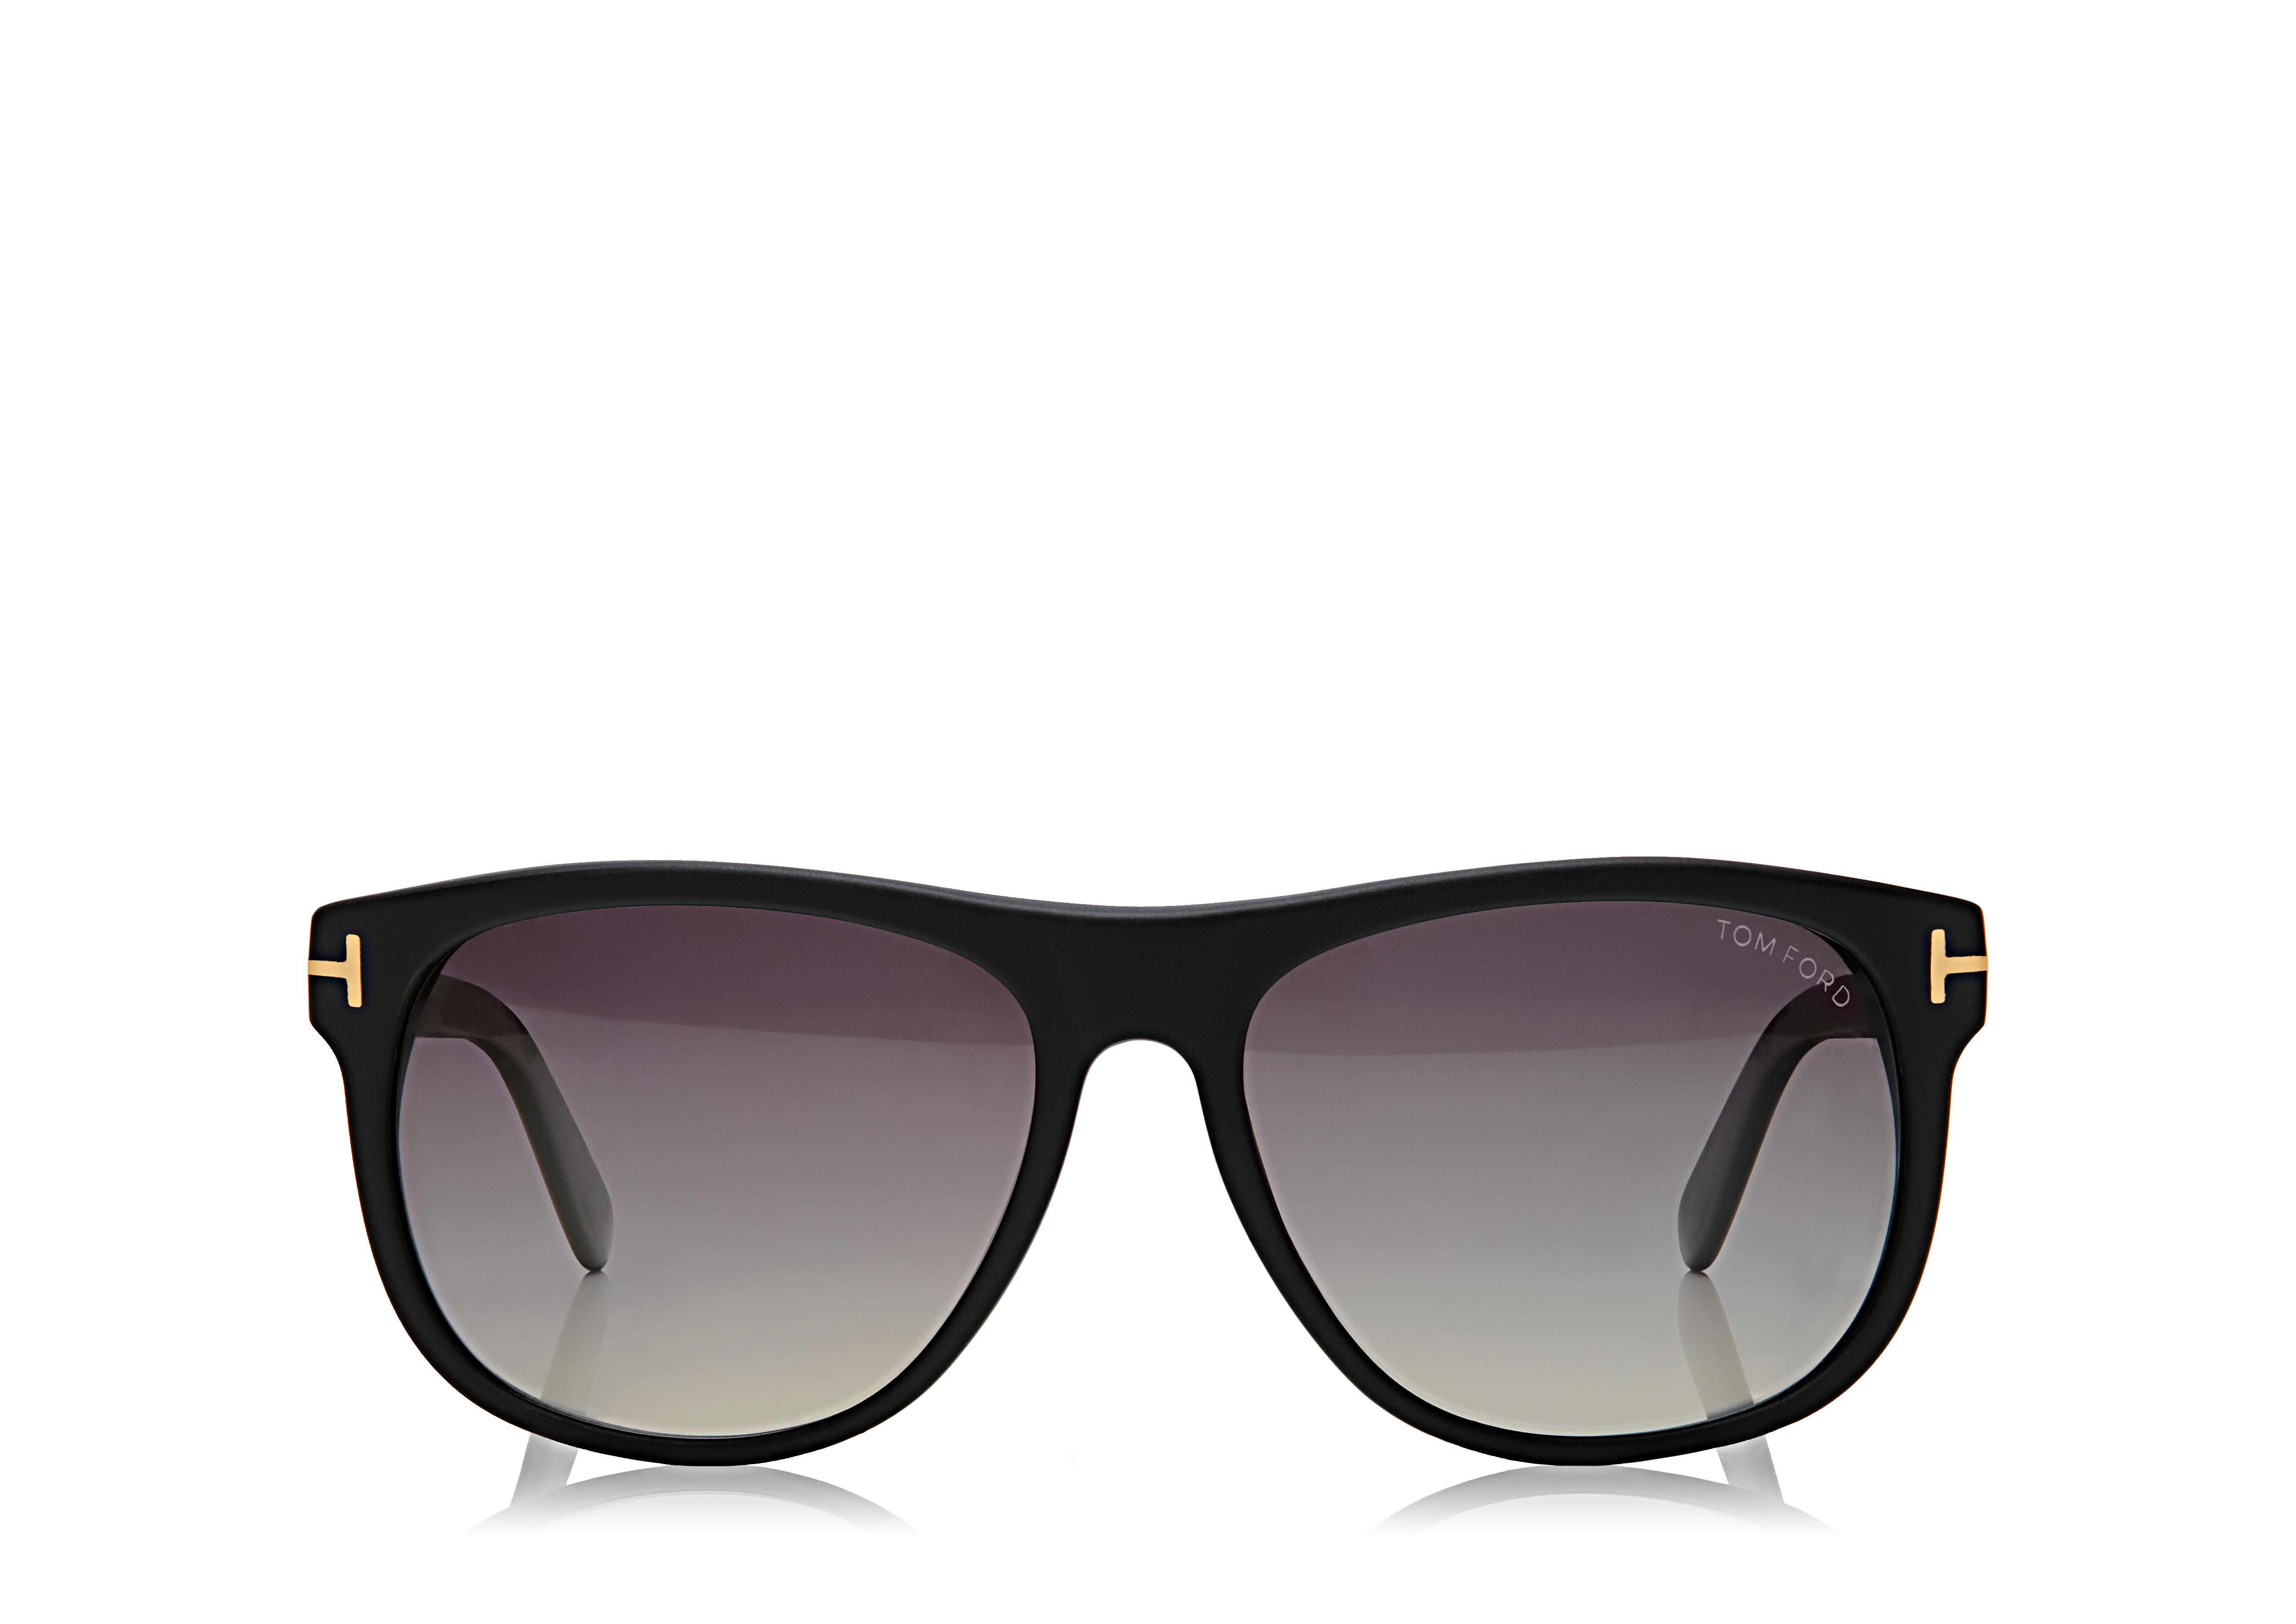 Olivier Soft Square Polarized Sunglasses A thumbnail